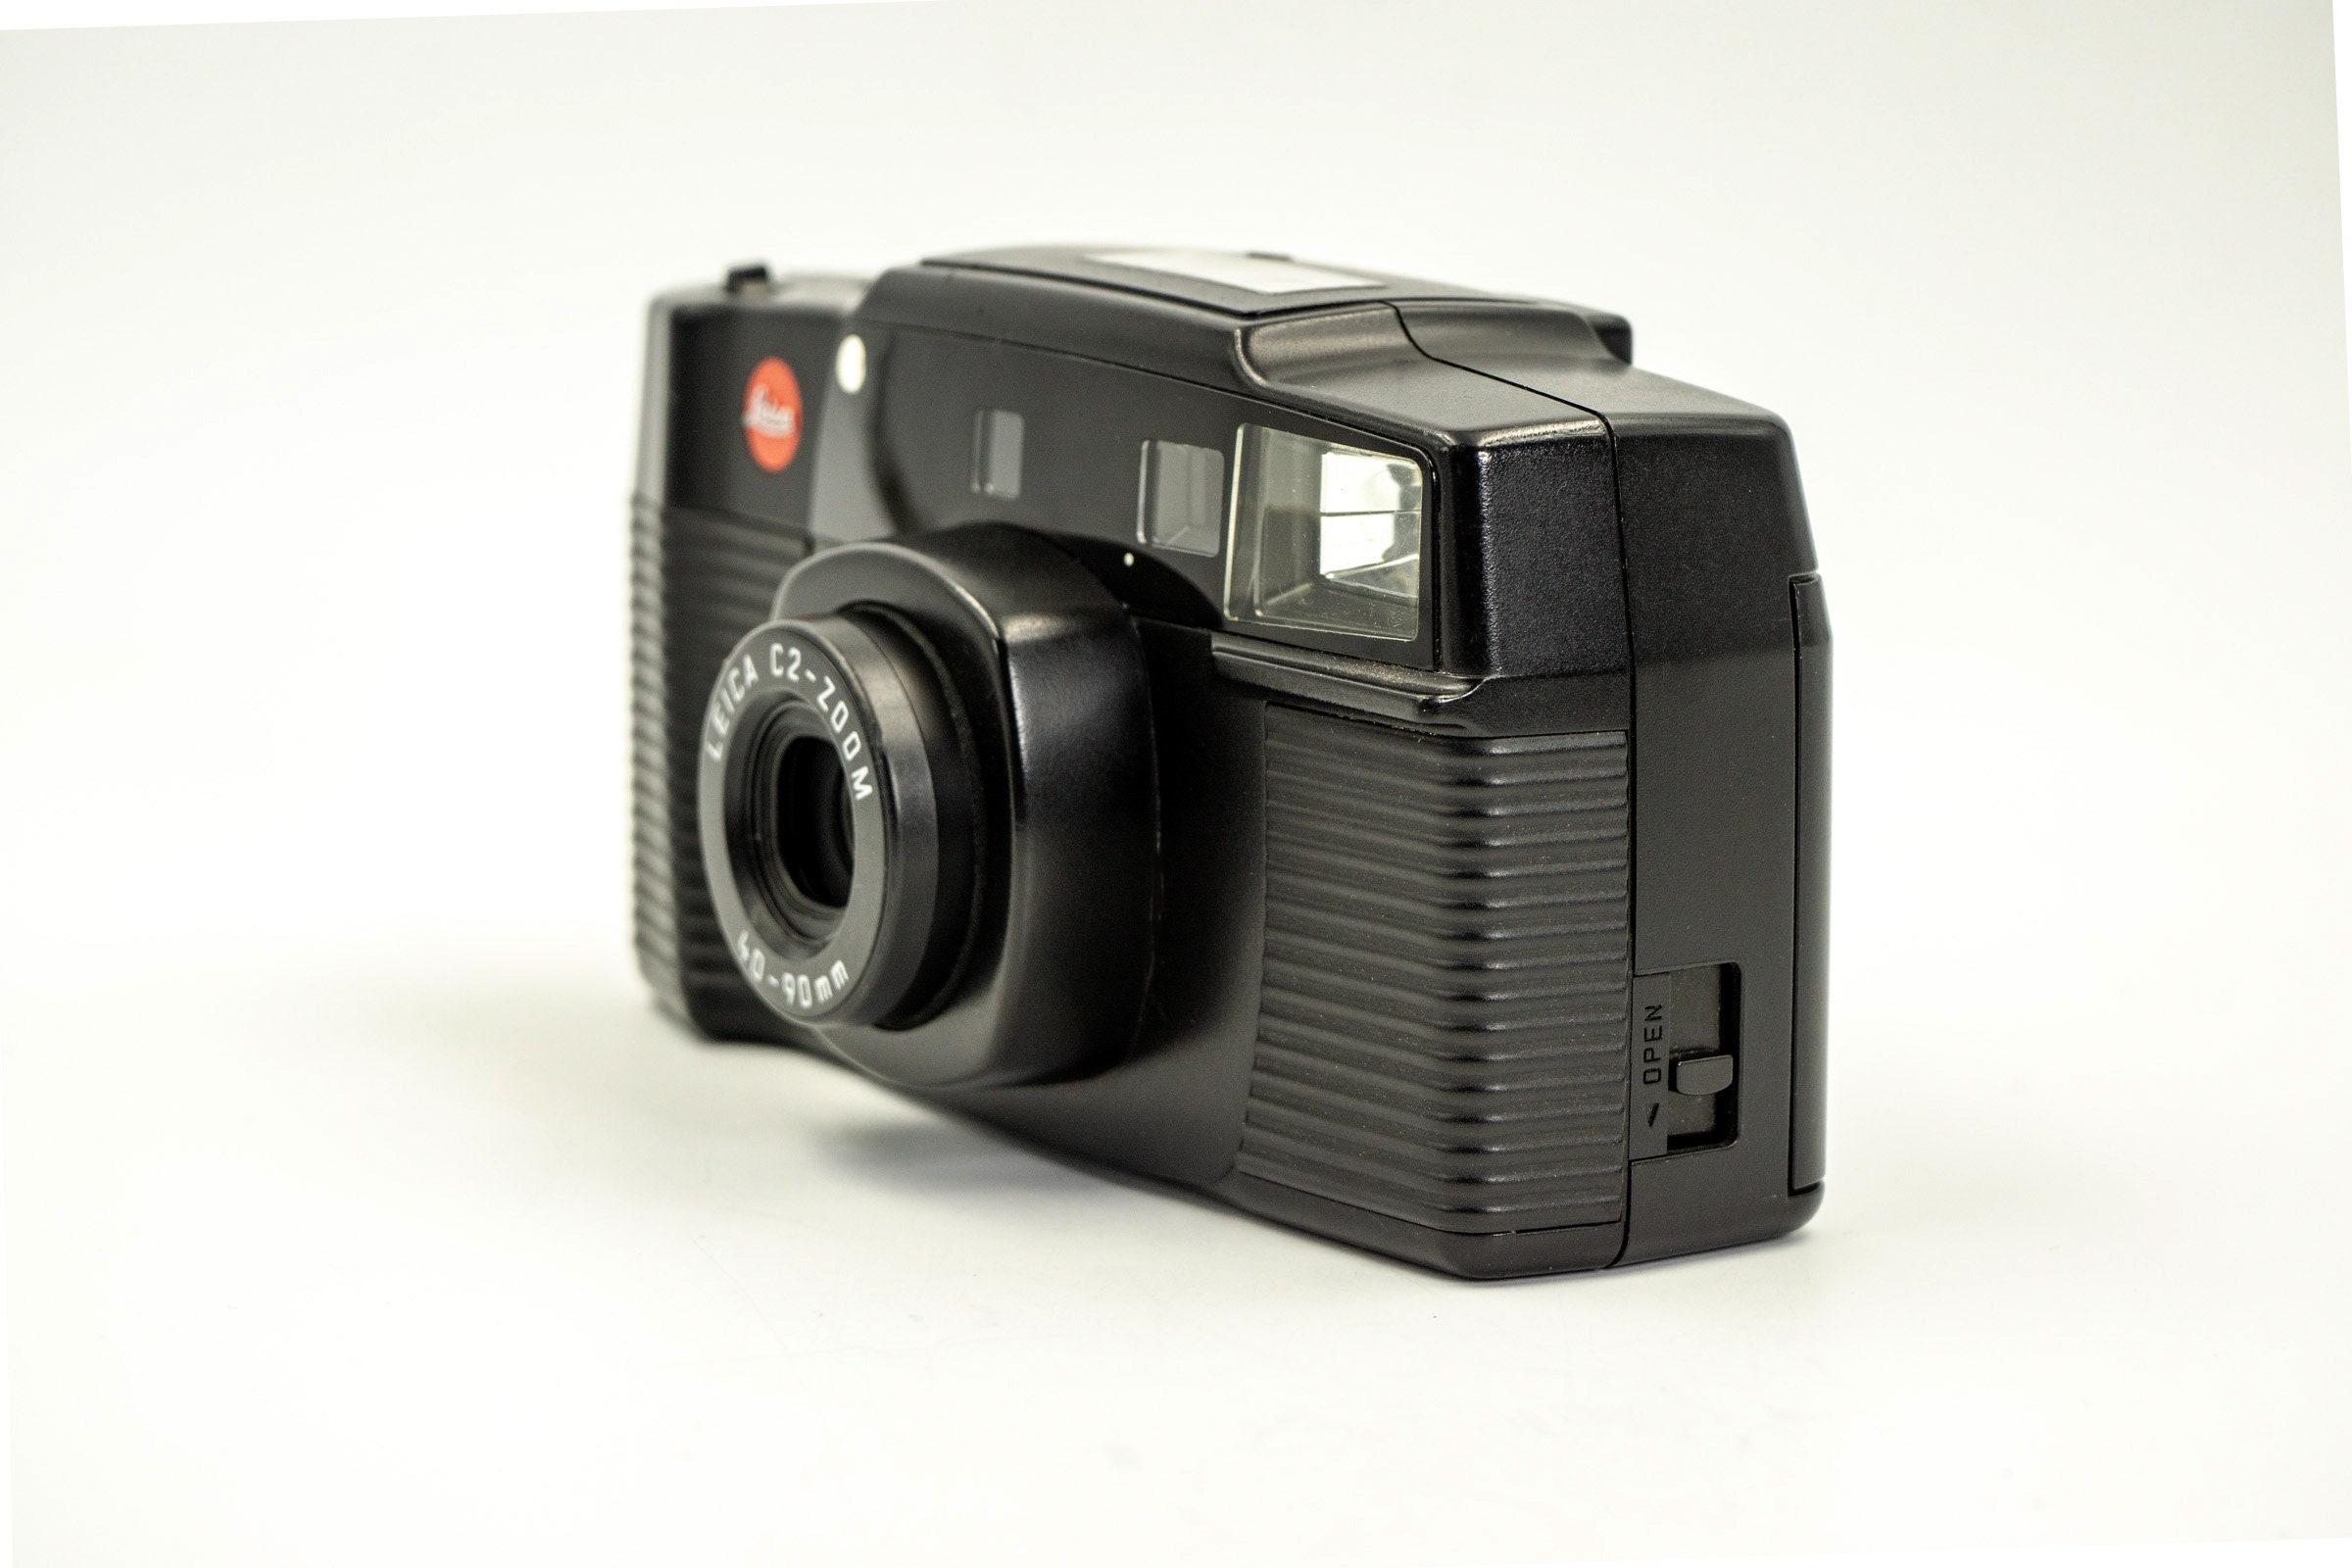 Leica 35mm Film Rangefinder C2 Zoom - Great High End Starter Camera